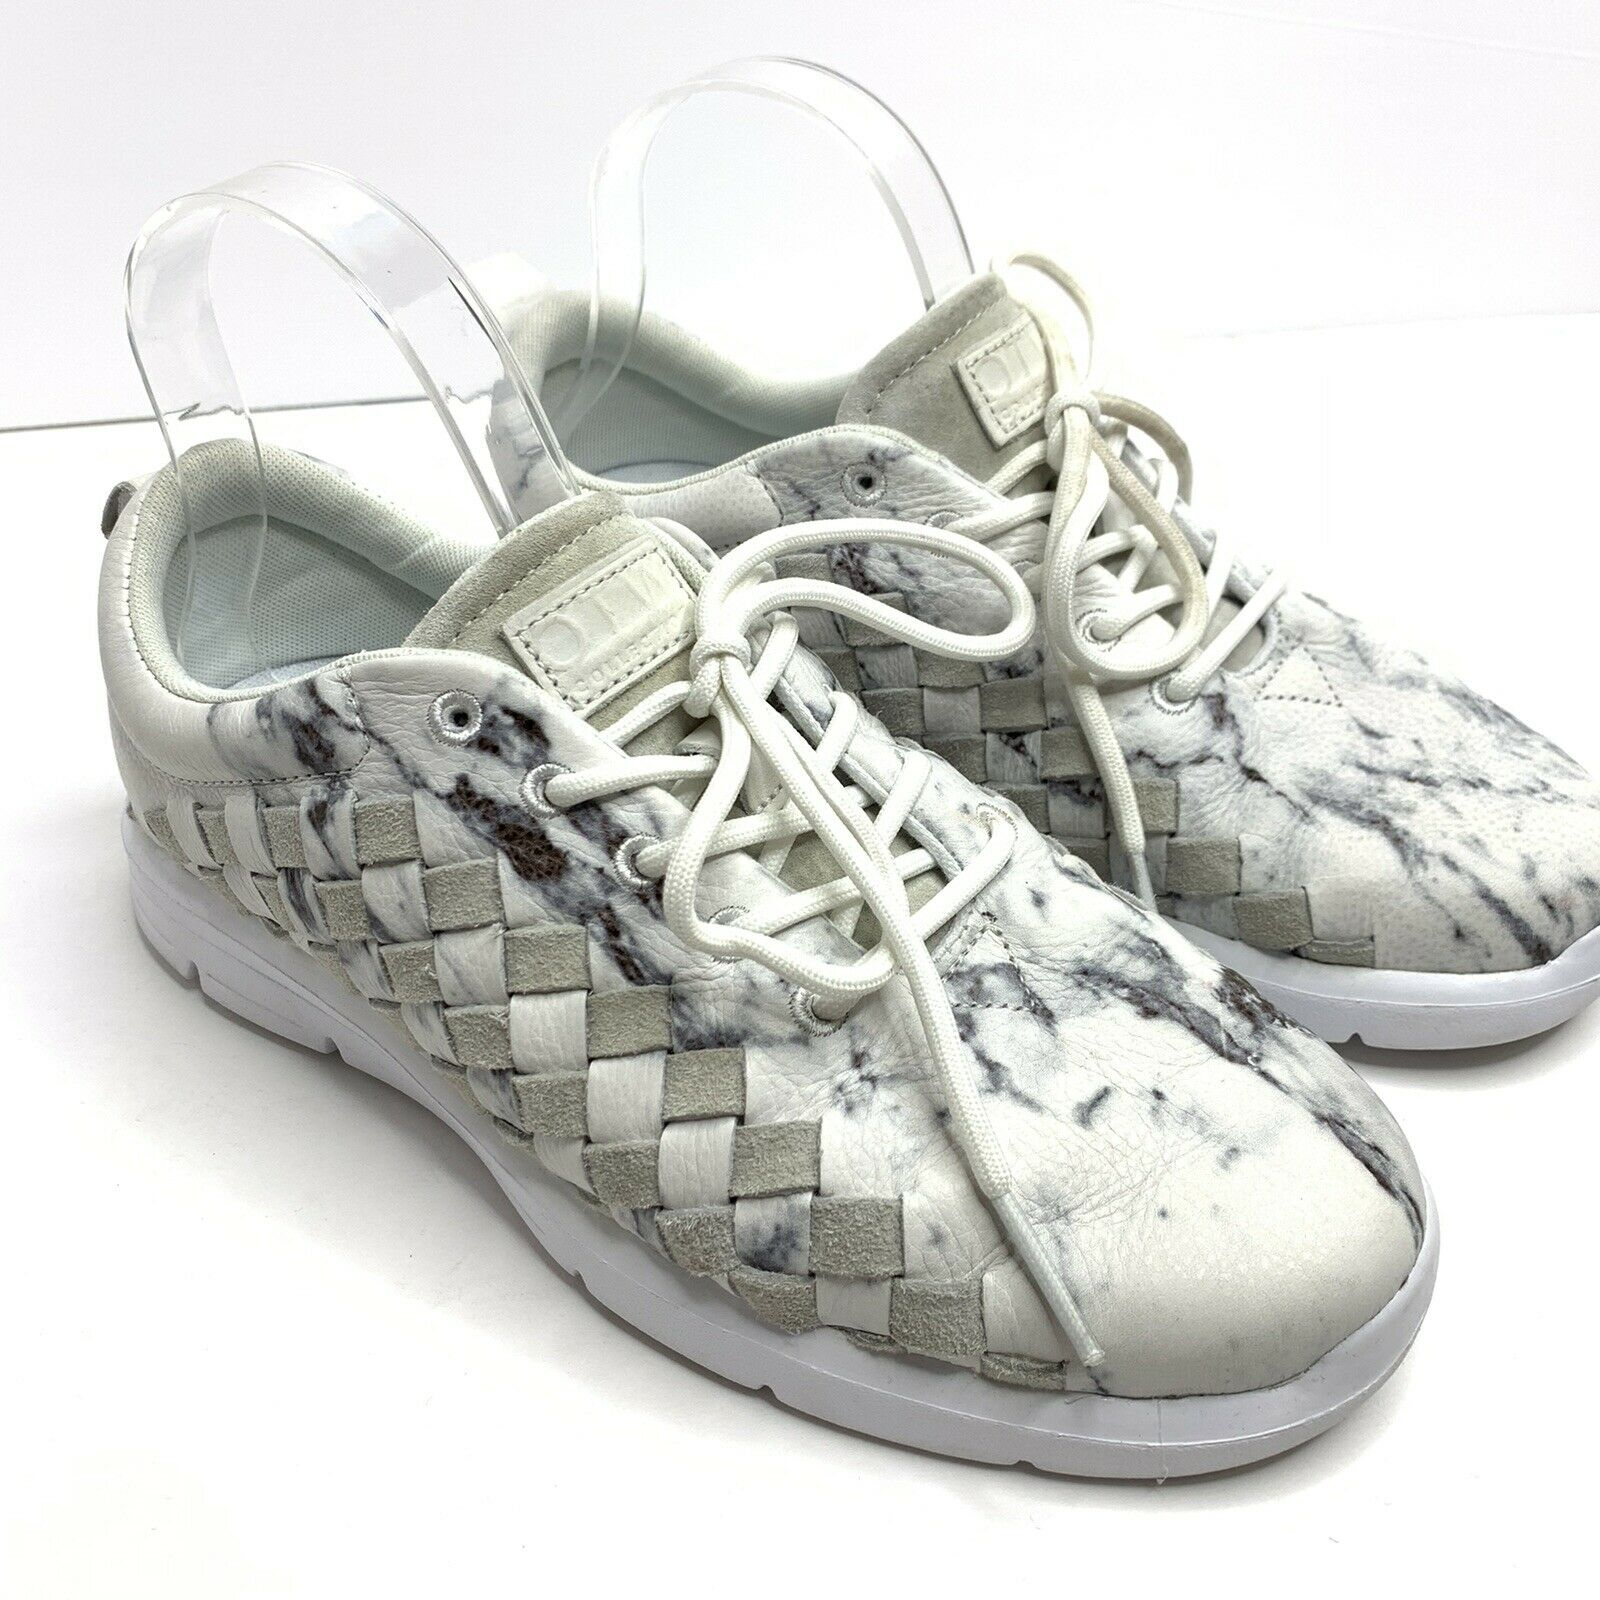 Vans Sneakers LXVI ISO OTW Prelow Tesella Skaterschuhe Turnschuhe AUSVERKAUF